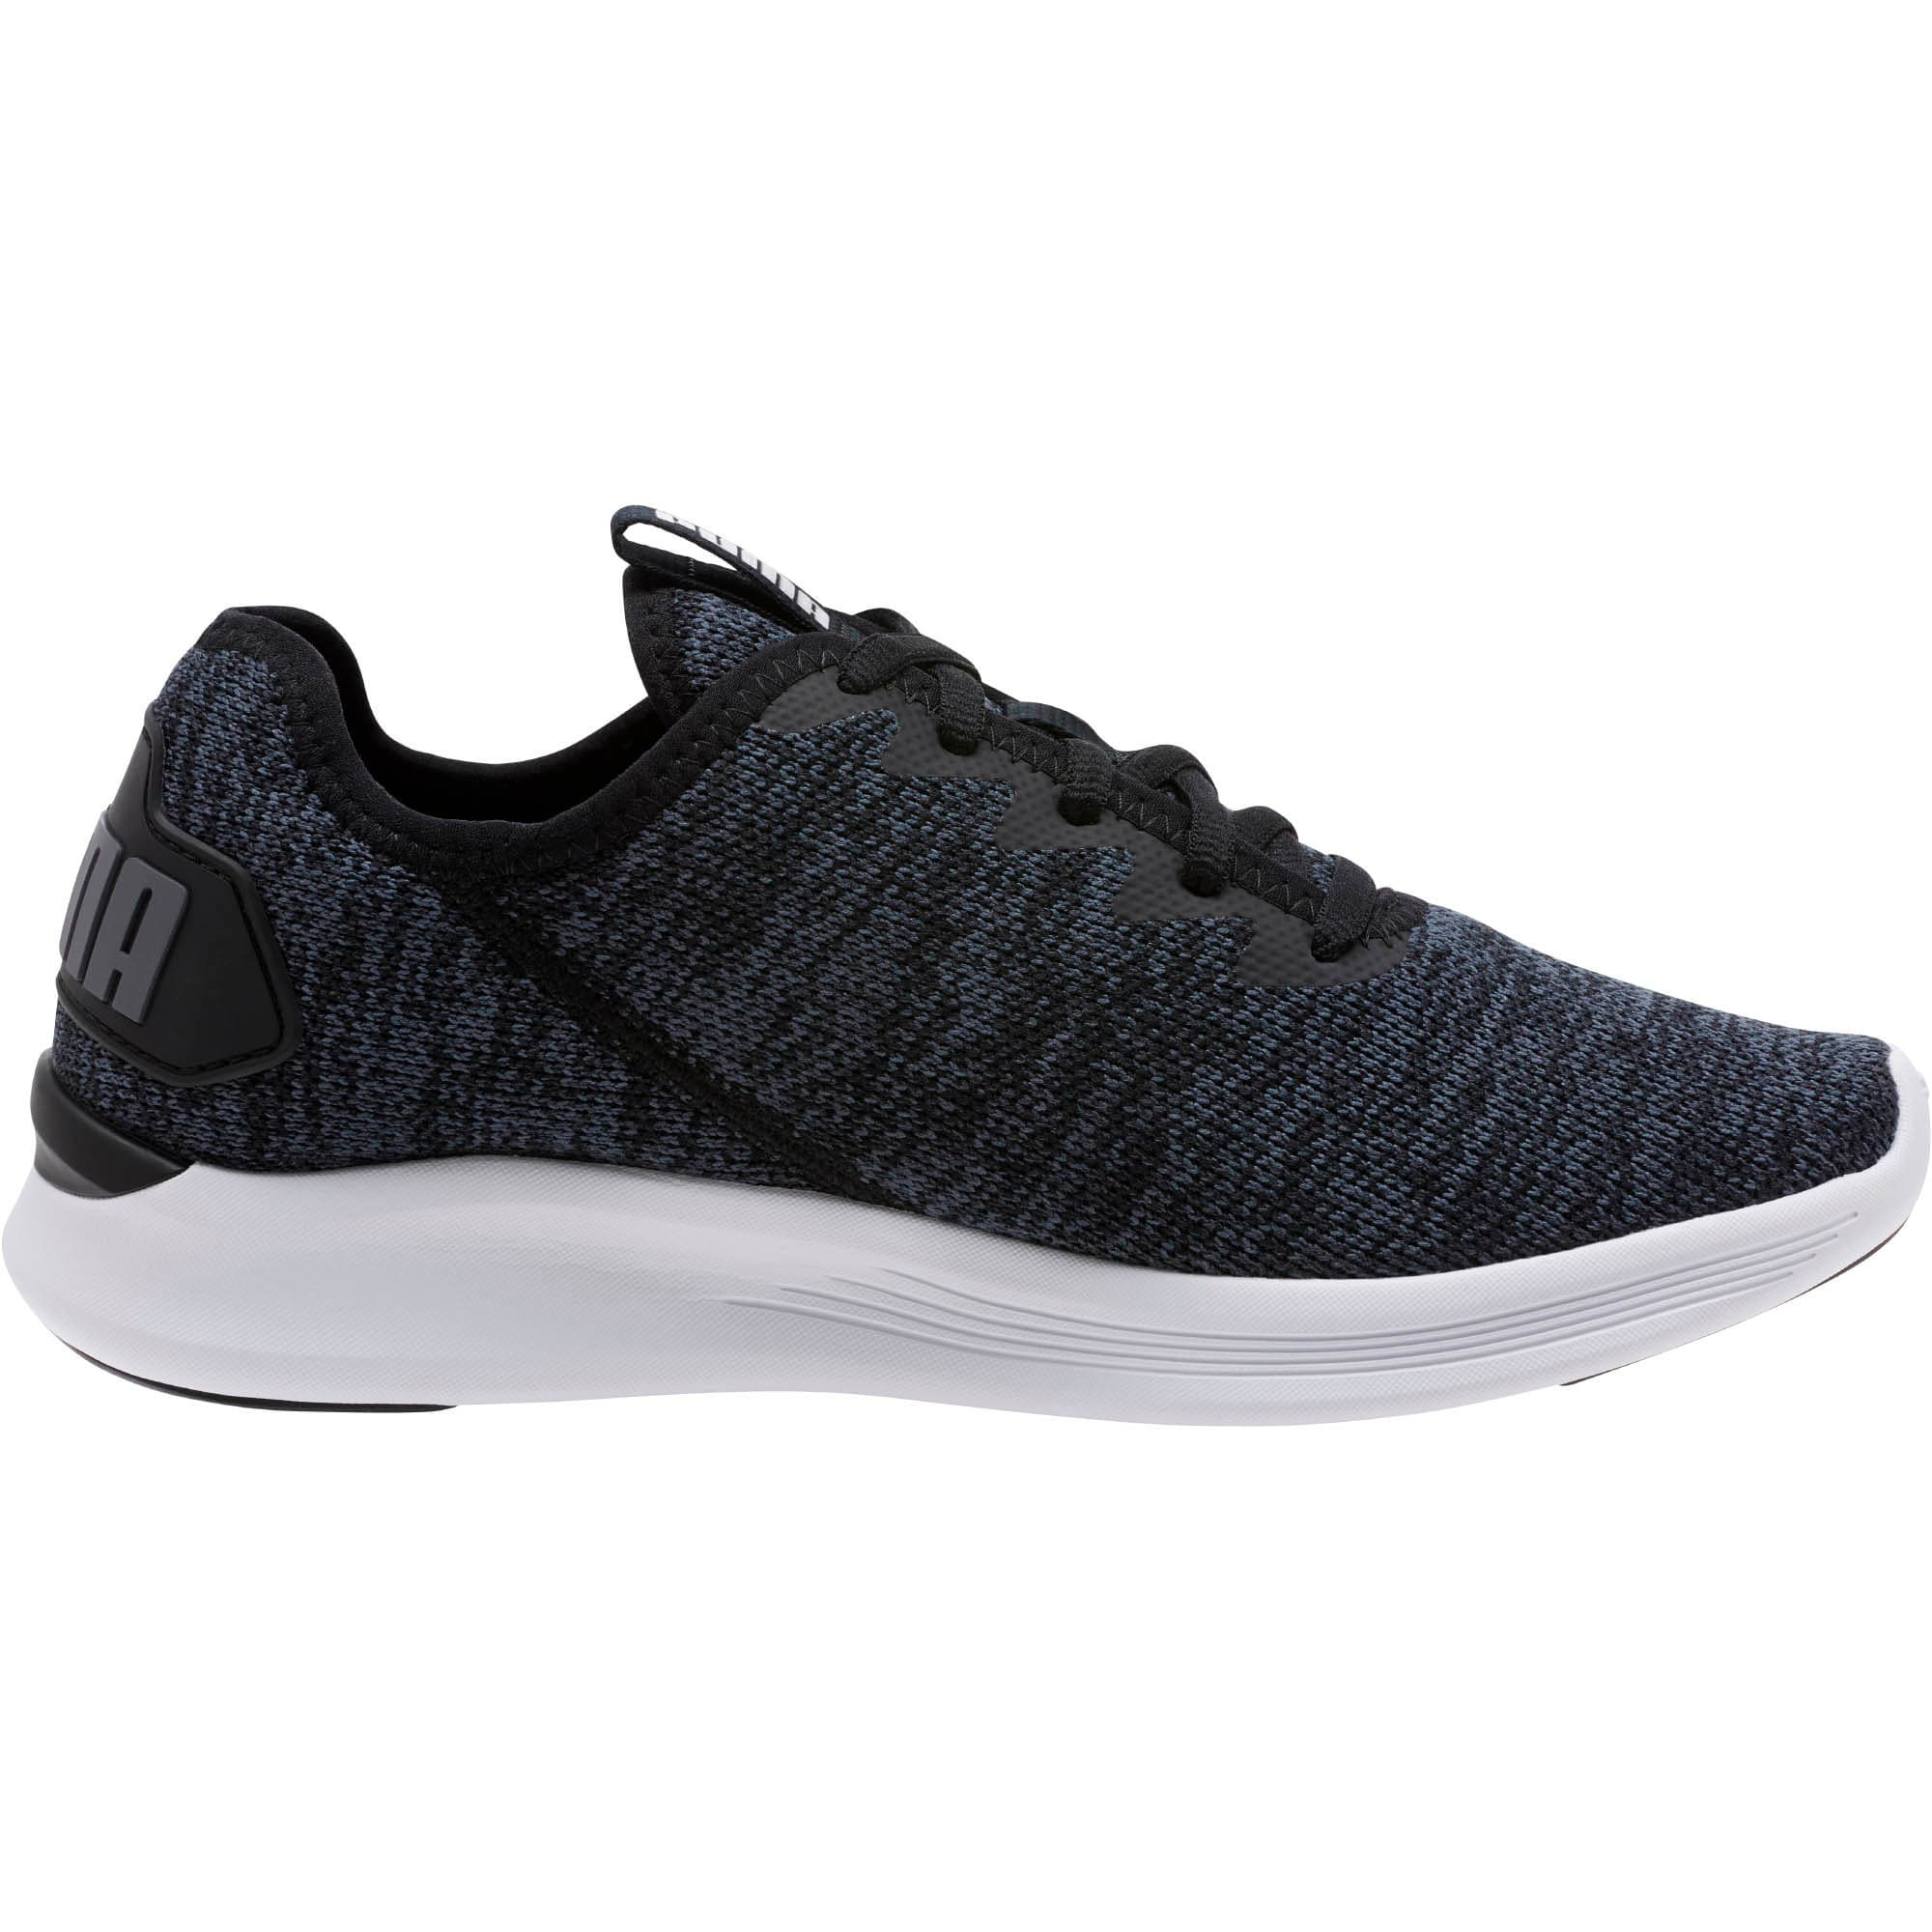 Thumbnail 4 of Ballast Women's Running Shoes, Puma Black-Iron Gate, medium